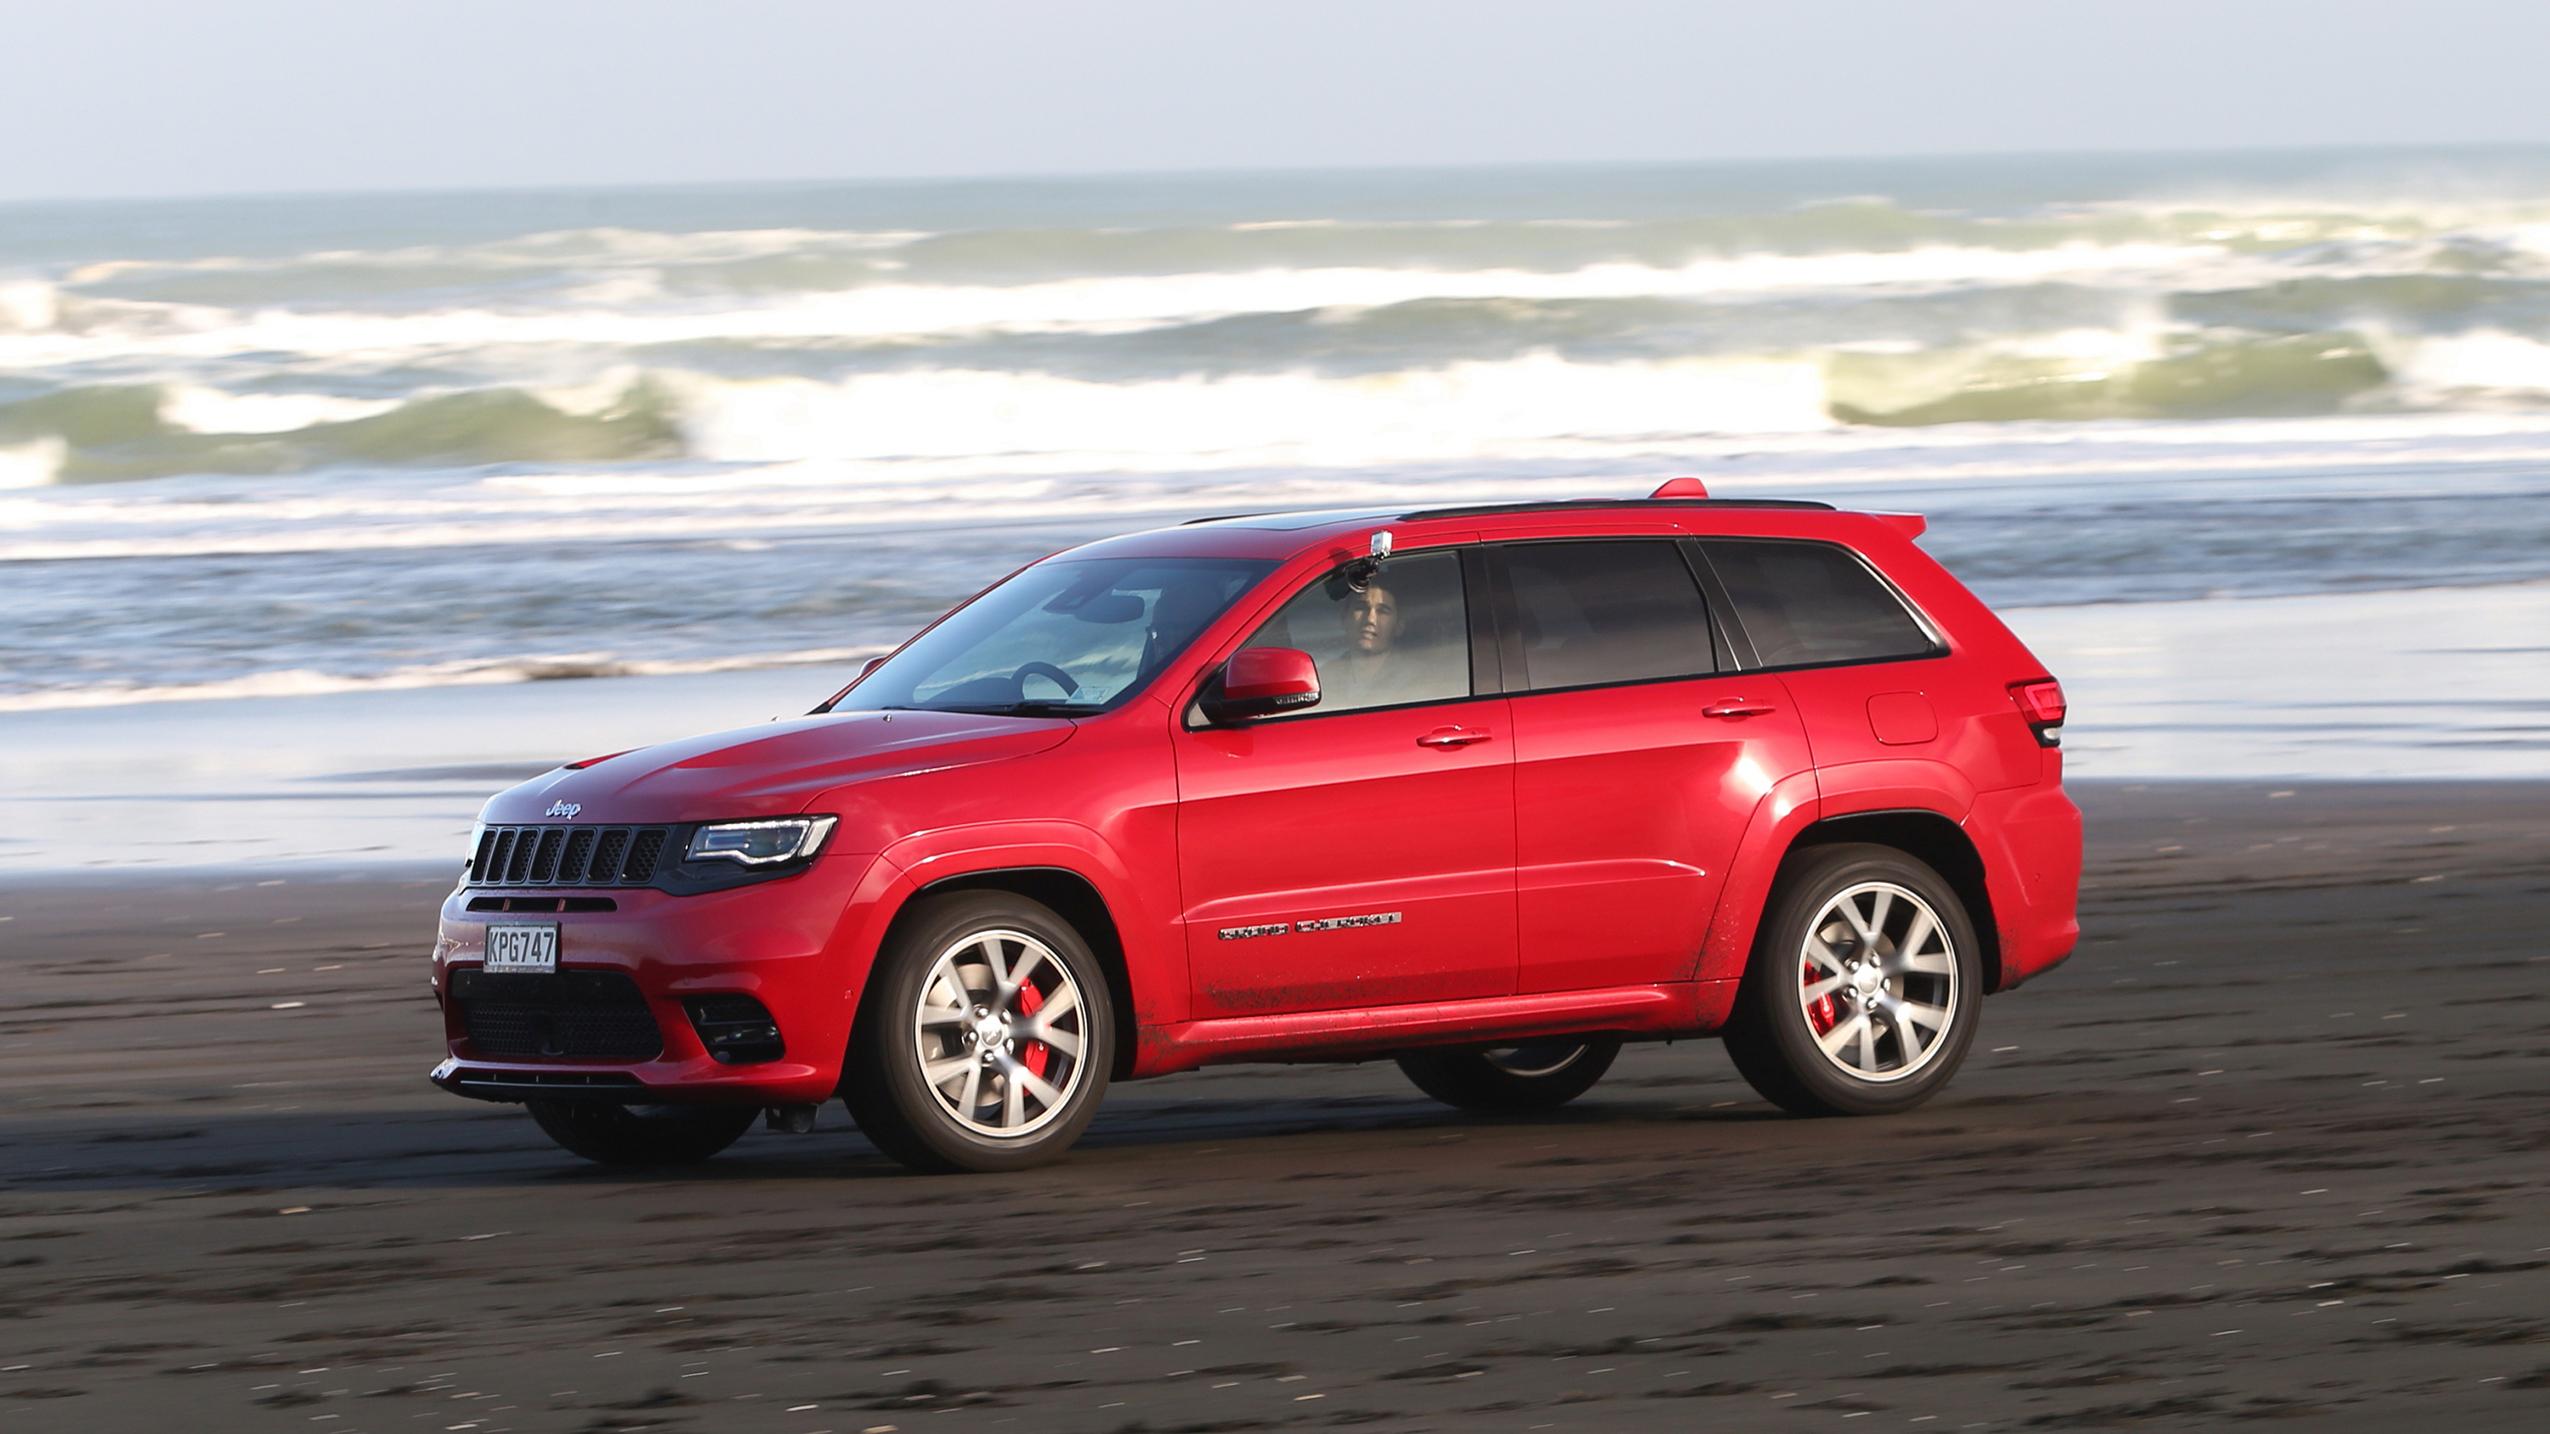 Honda crv gas tank size 2017 2018 honda reviews for Honda jeep 2017